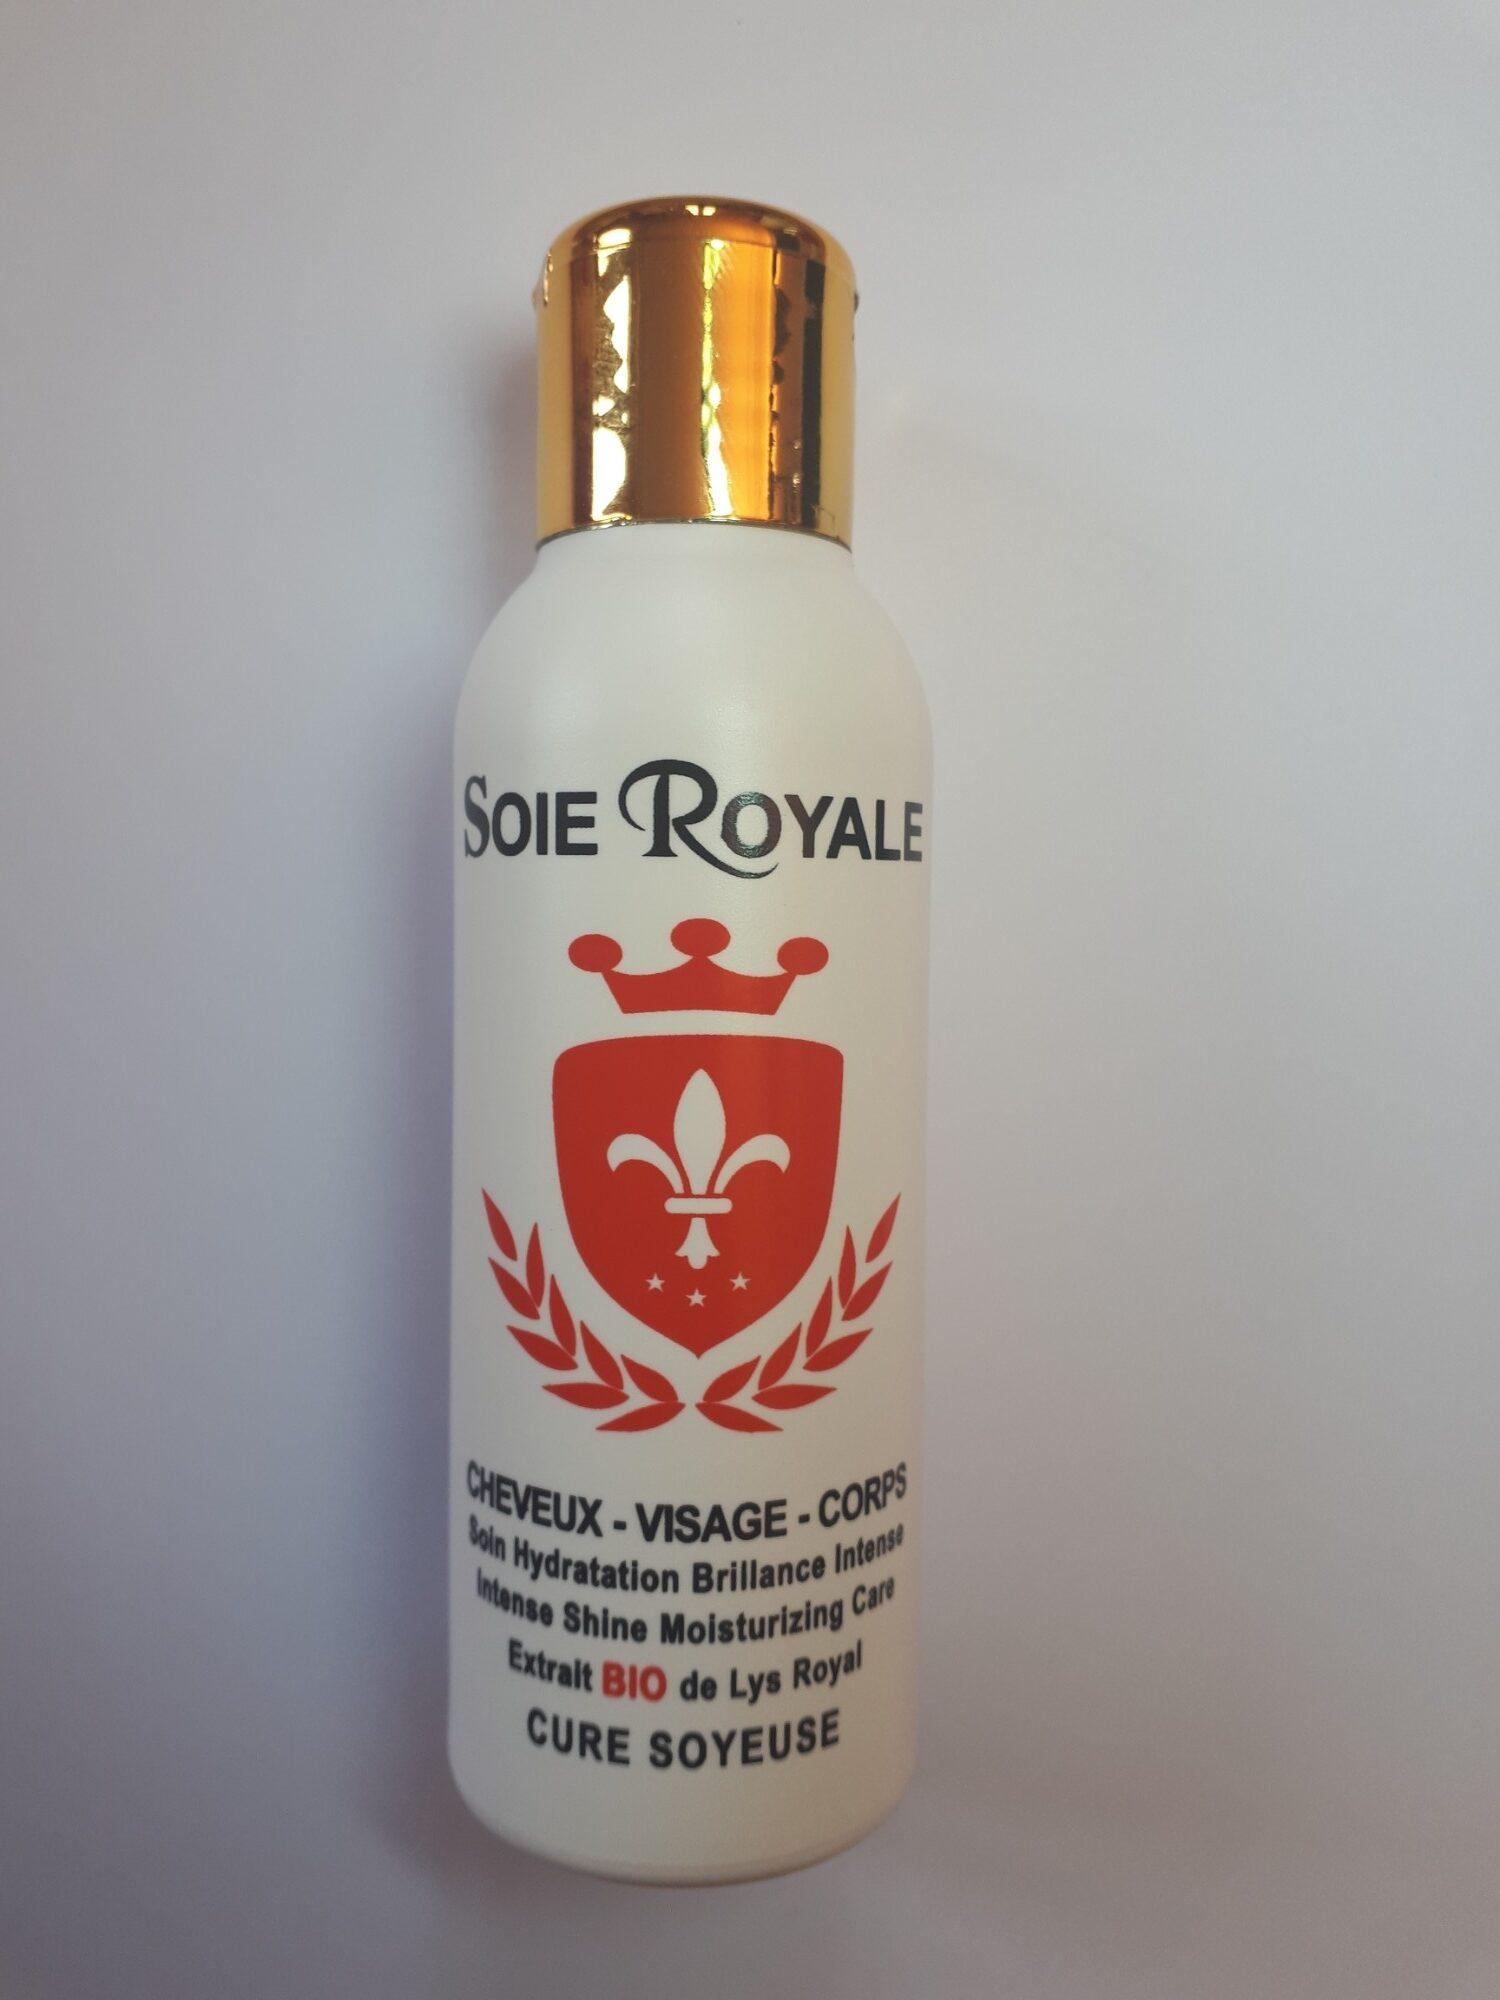 Soie royale BIO Cure Soyeuse - Product